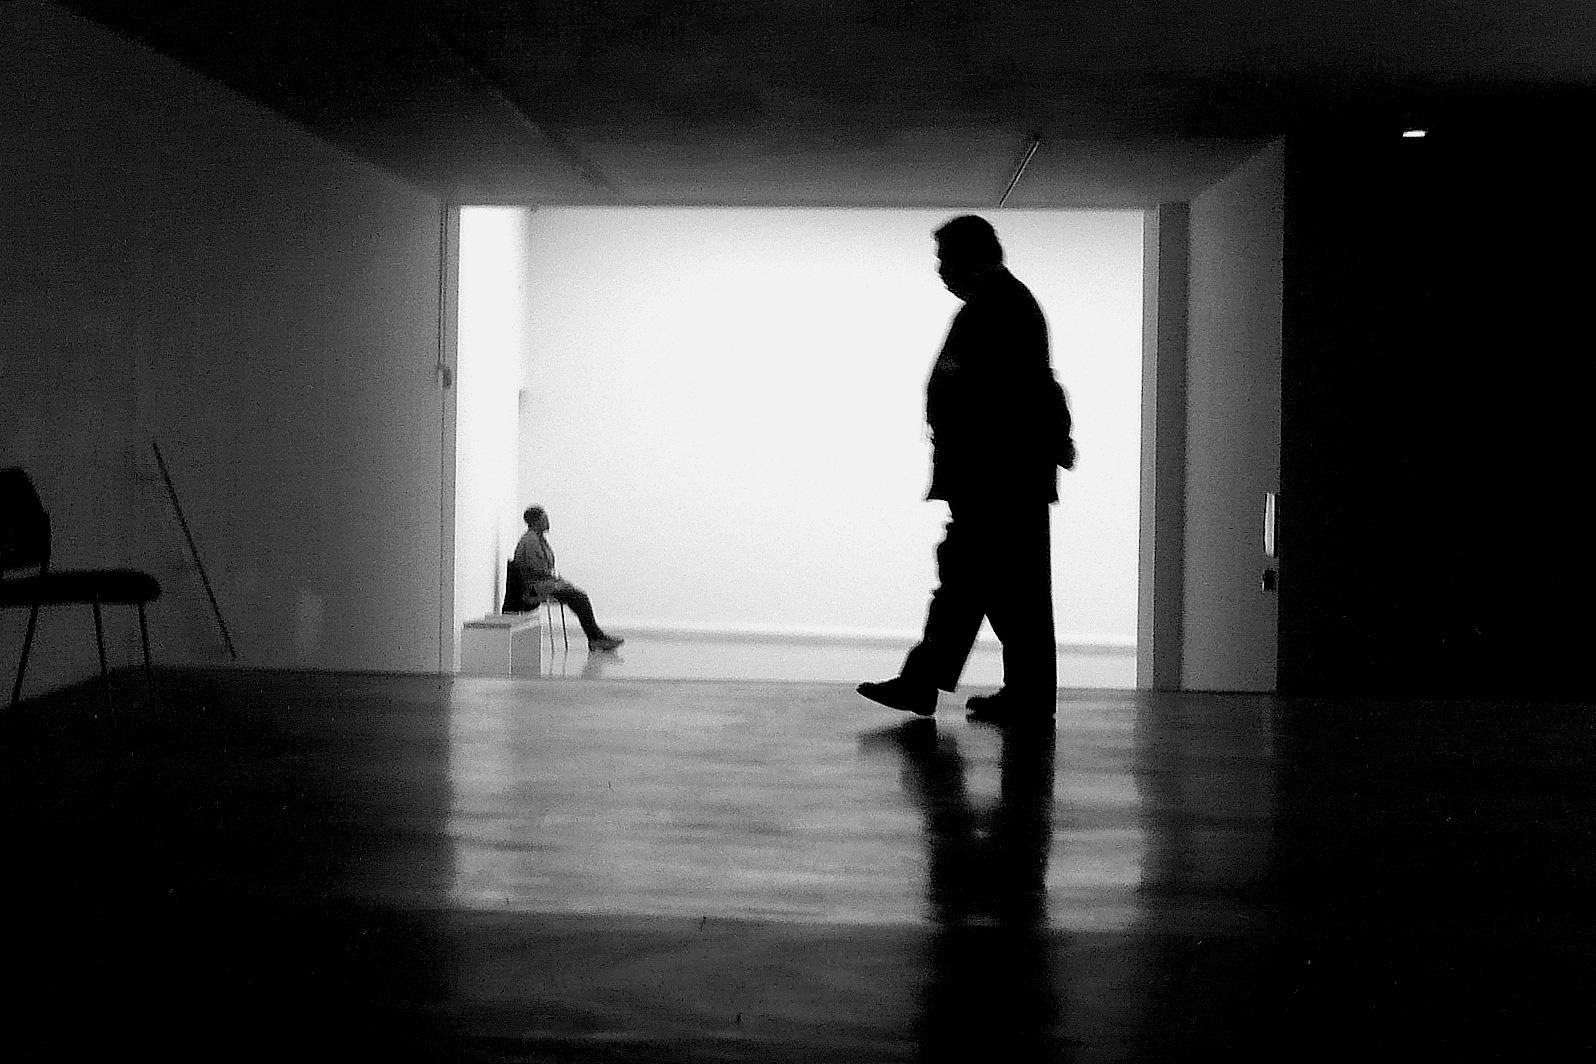 Waiting #7 by Gernot Schwarz